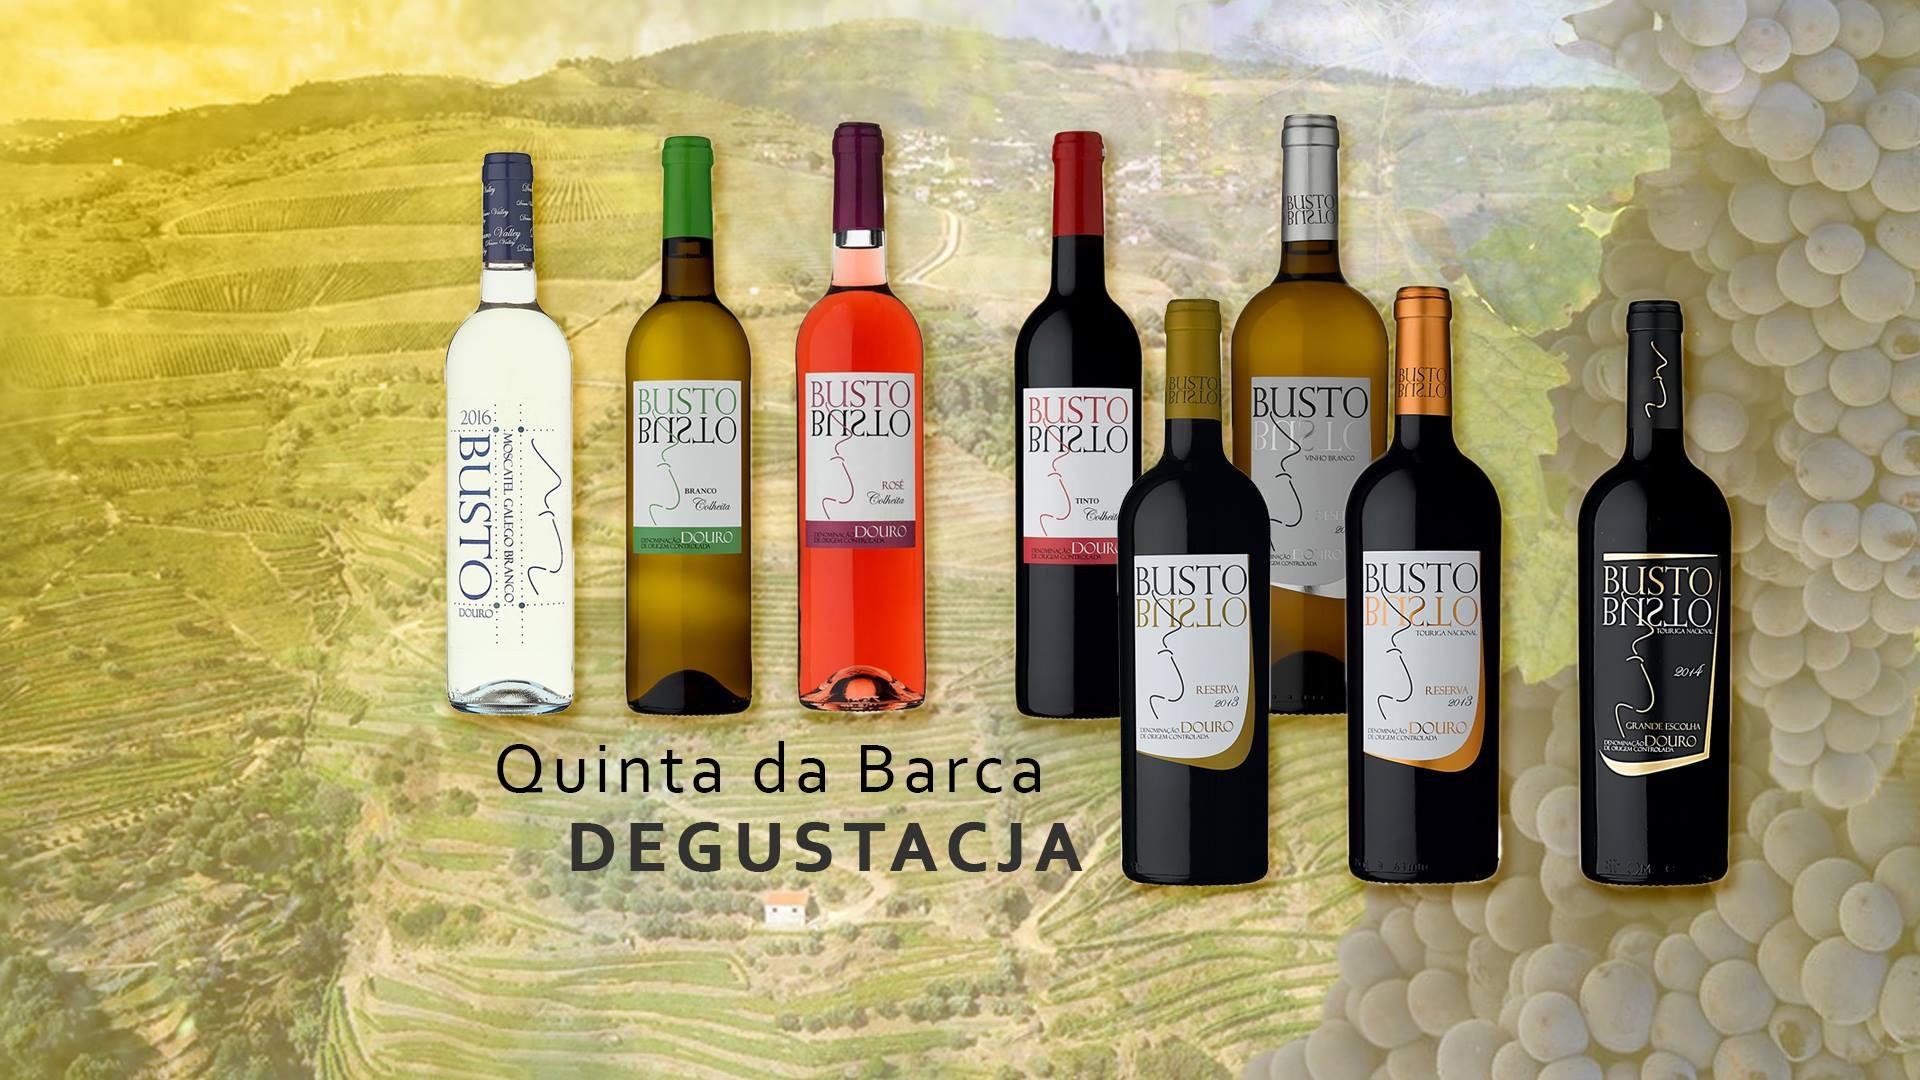 Busto DOC Douro